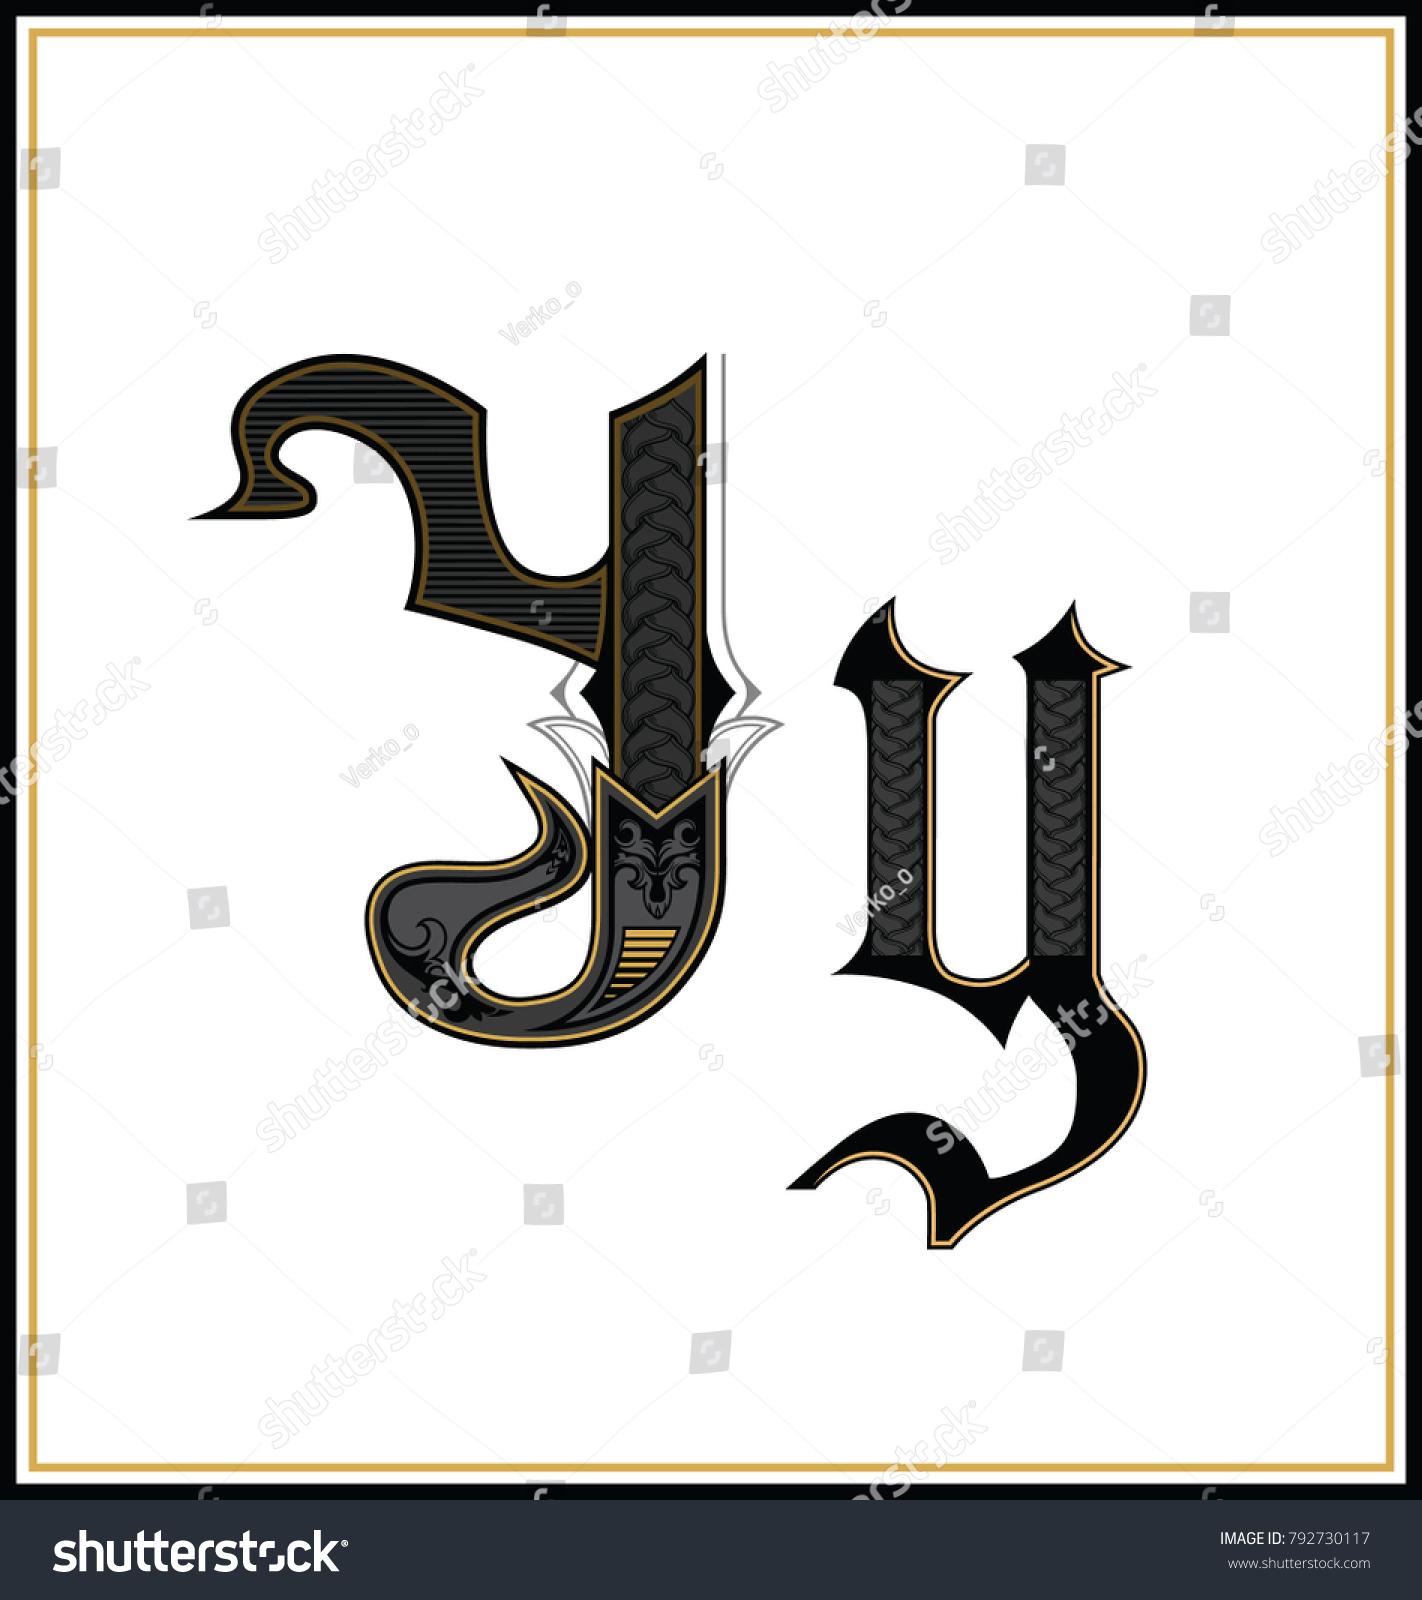 Gothic Font Letter Vintage Design Text Symbol Antique Calligraphy Old Lettering Retro Style